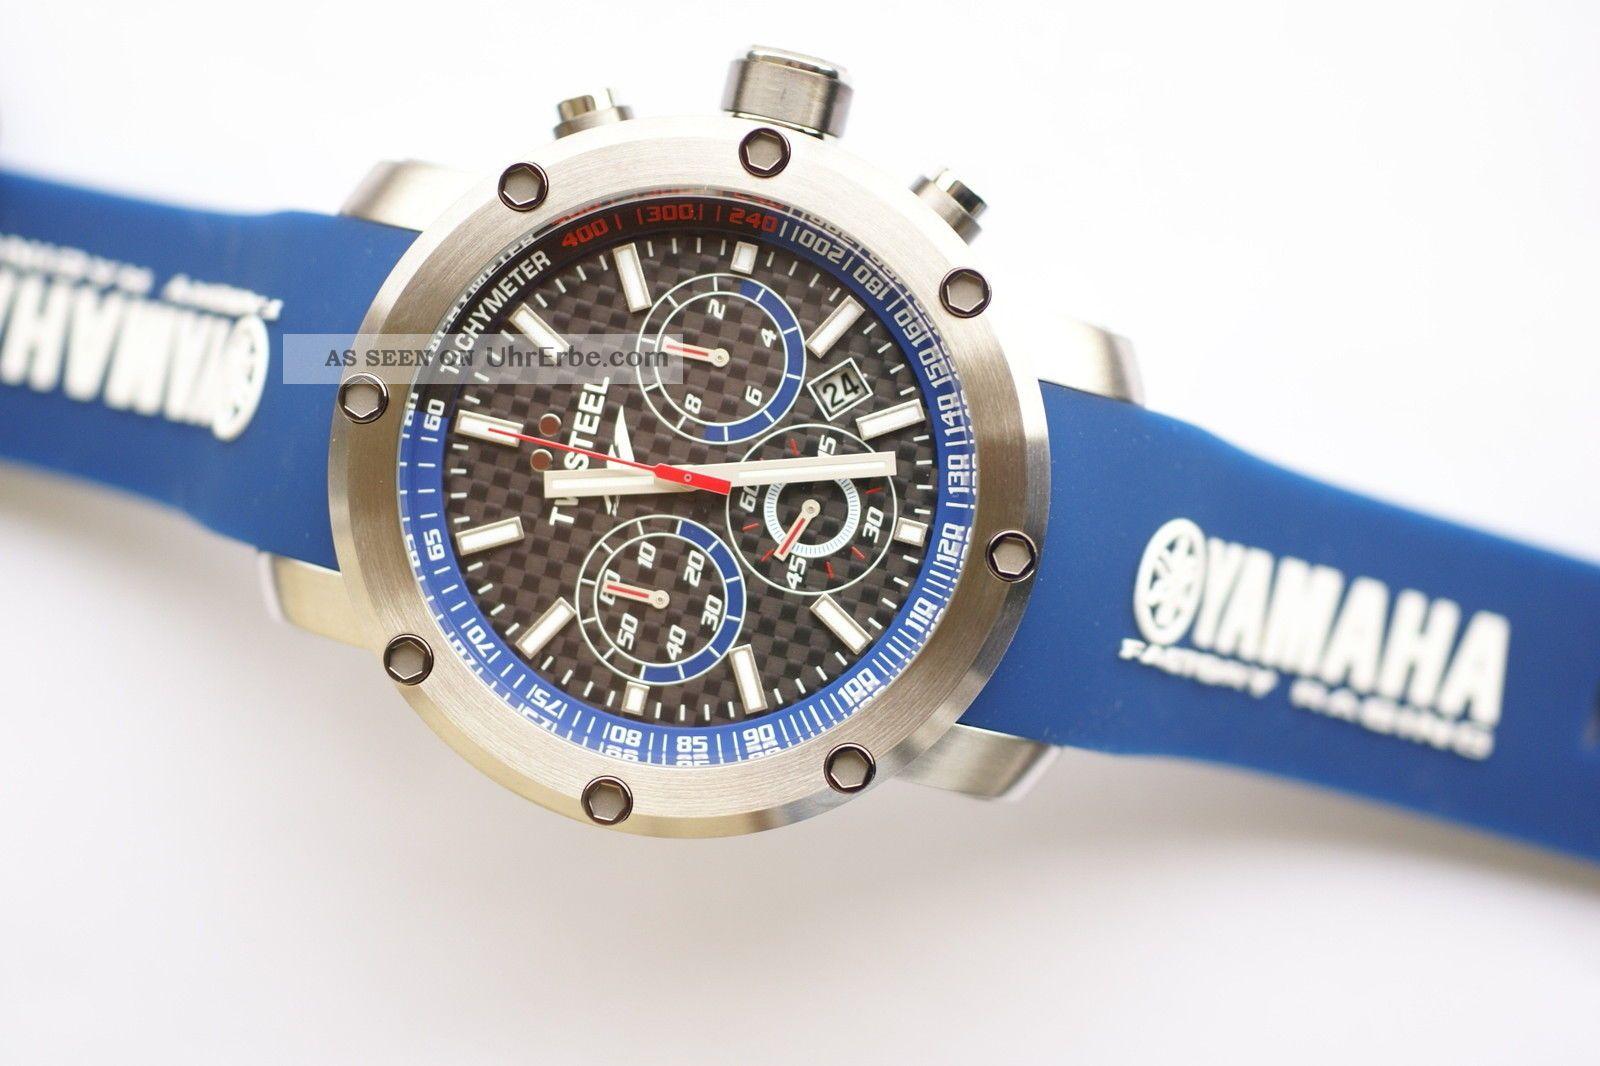 Tw - Steel Yamaha Racing,  Xxl 48mm,  Tw925 Armbanduhren Bild